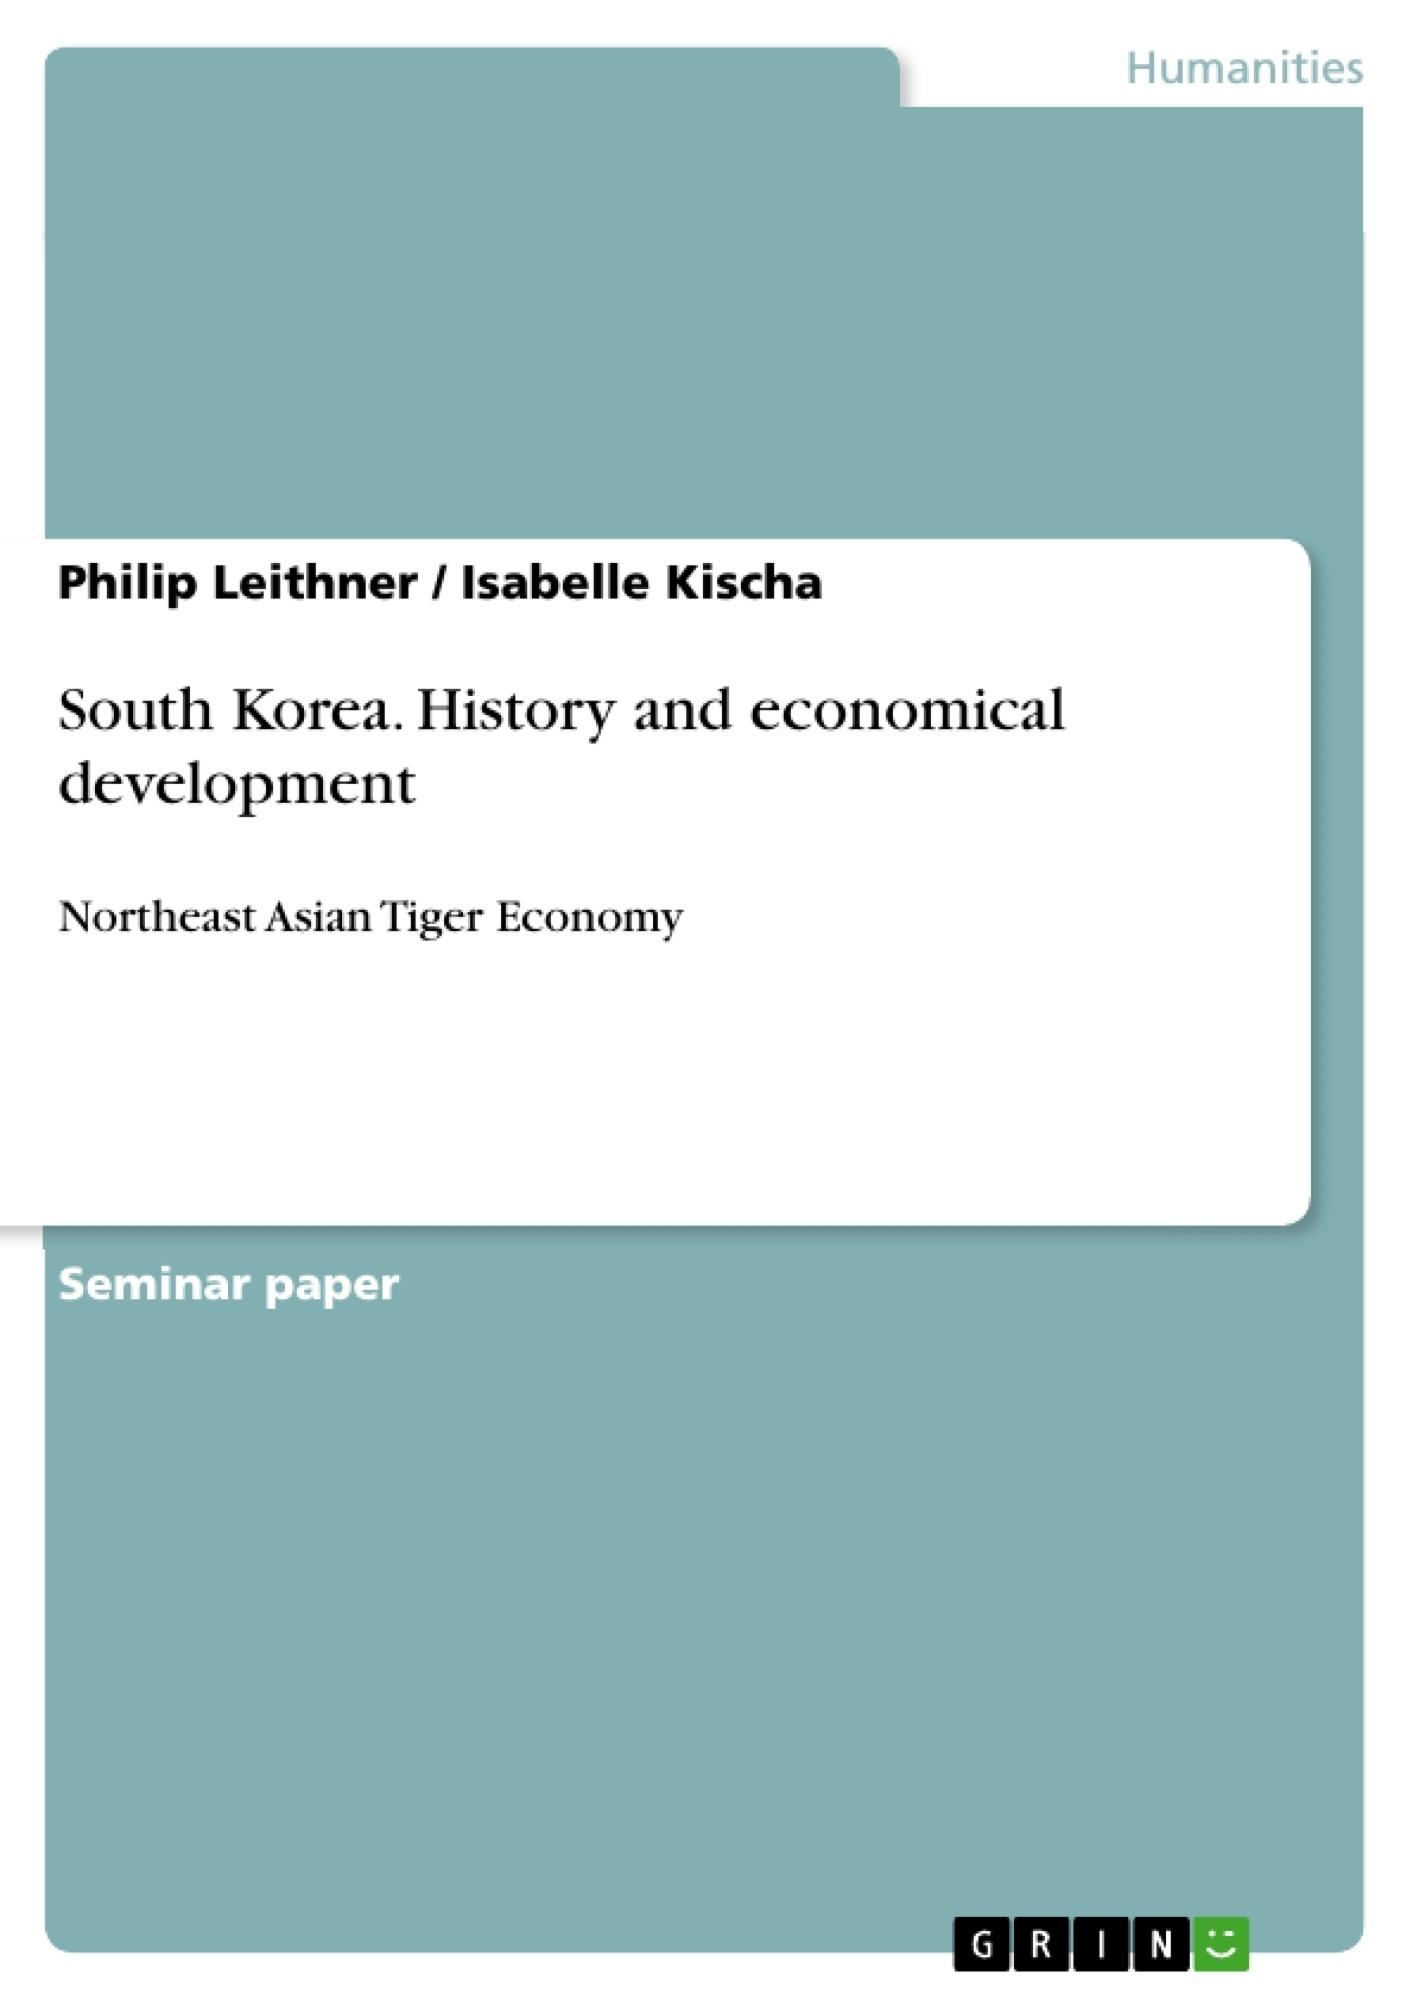 Title: South Korea. History and economical development